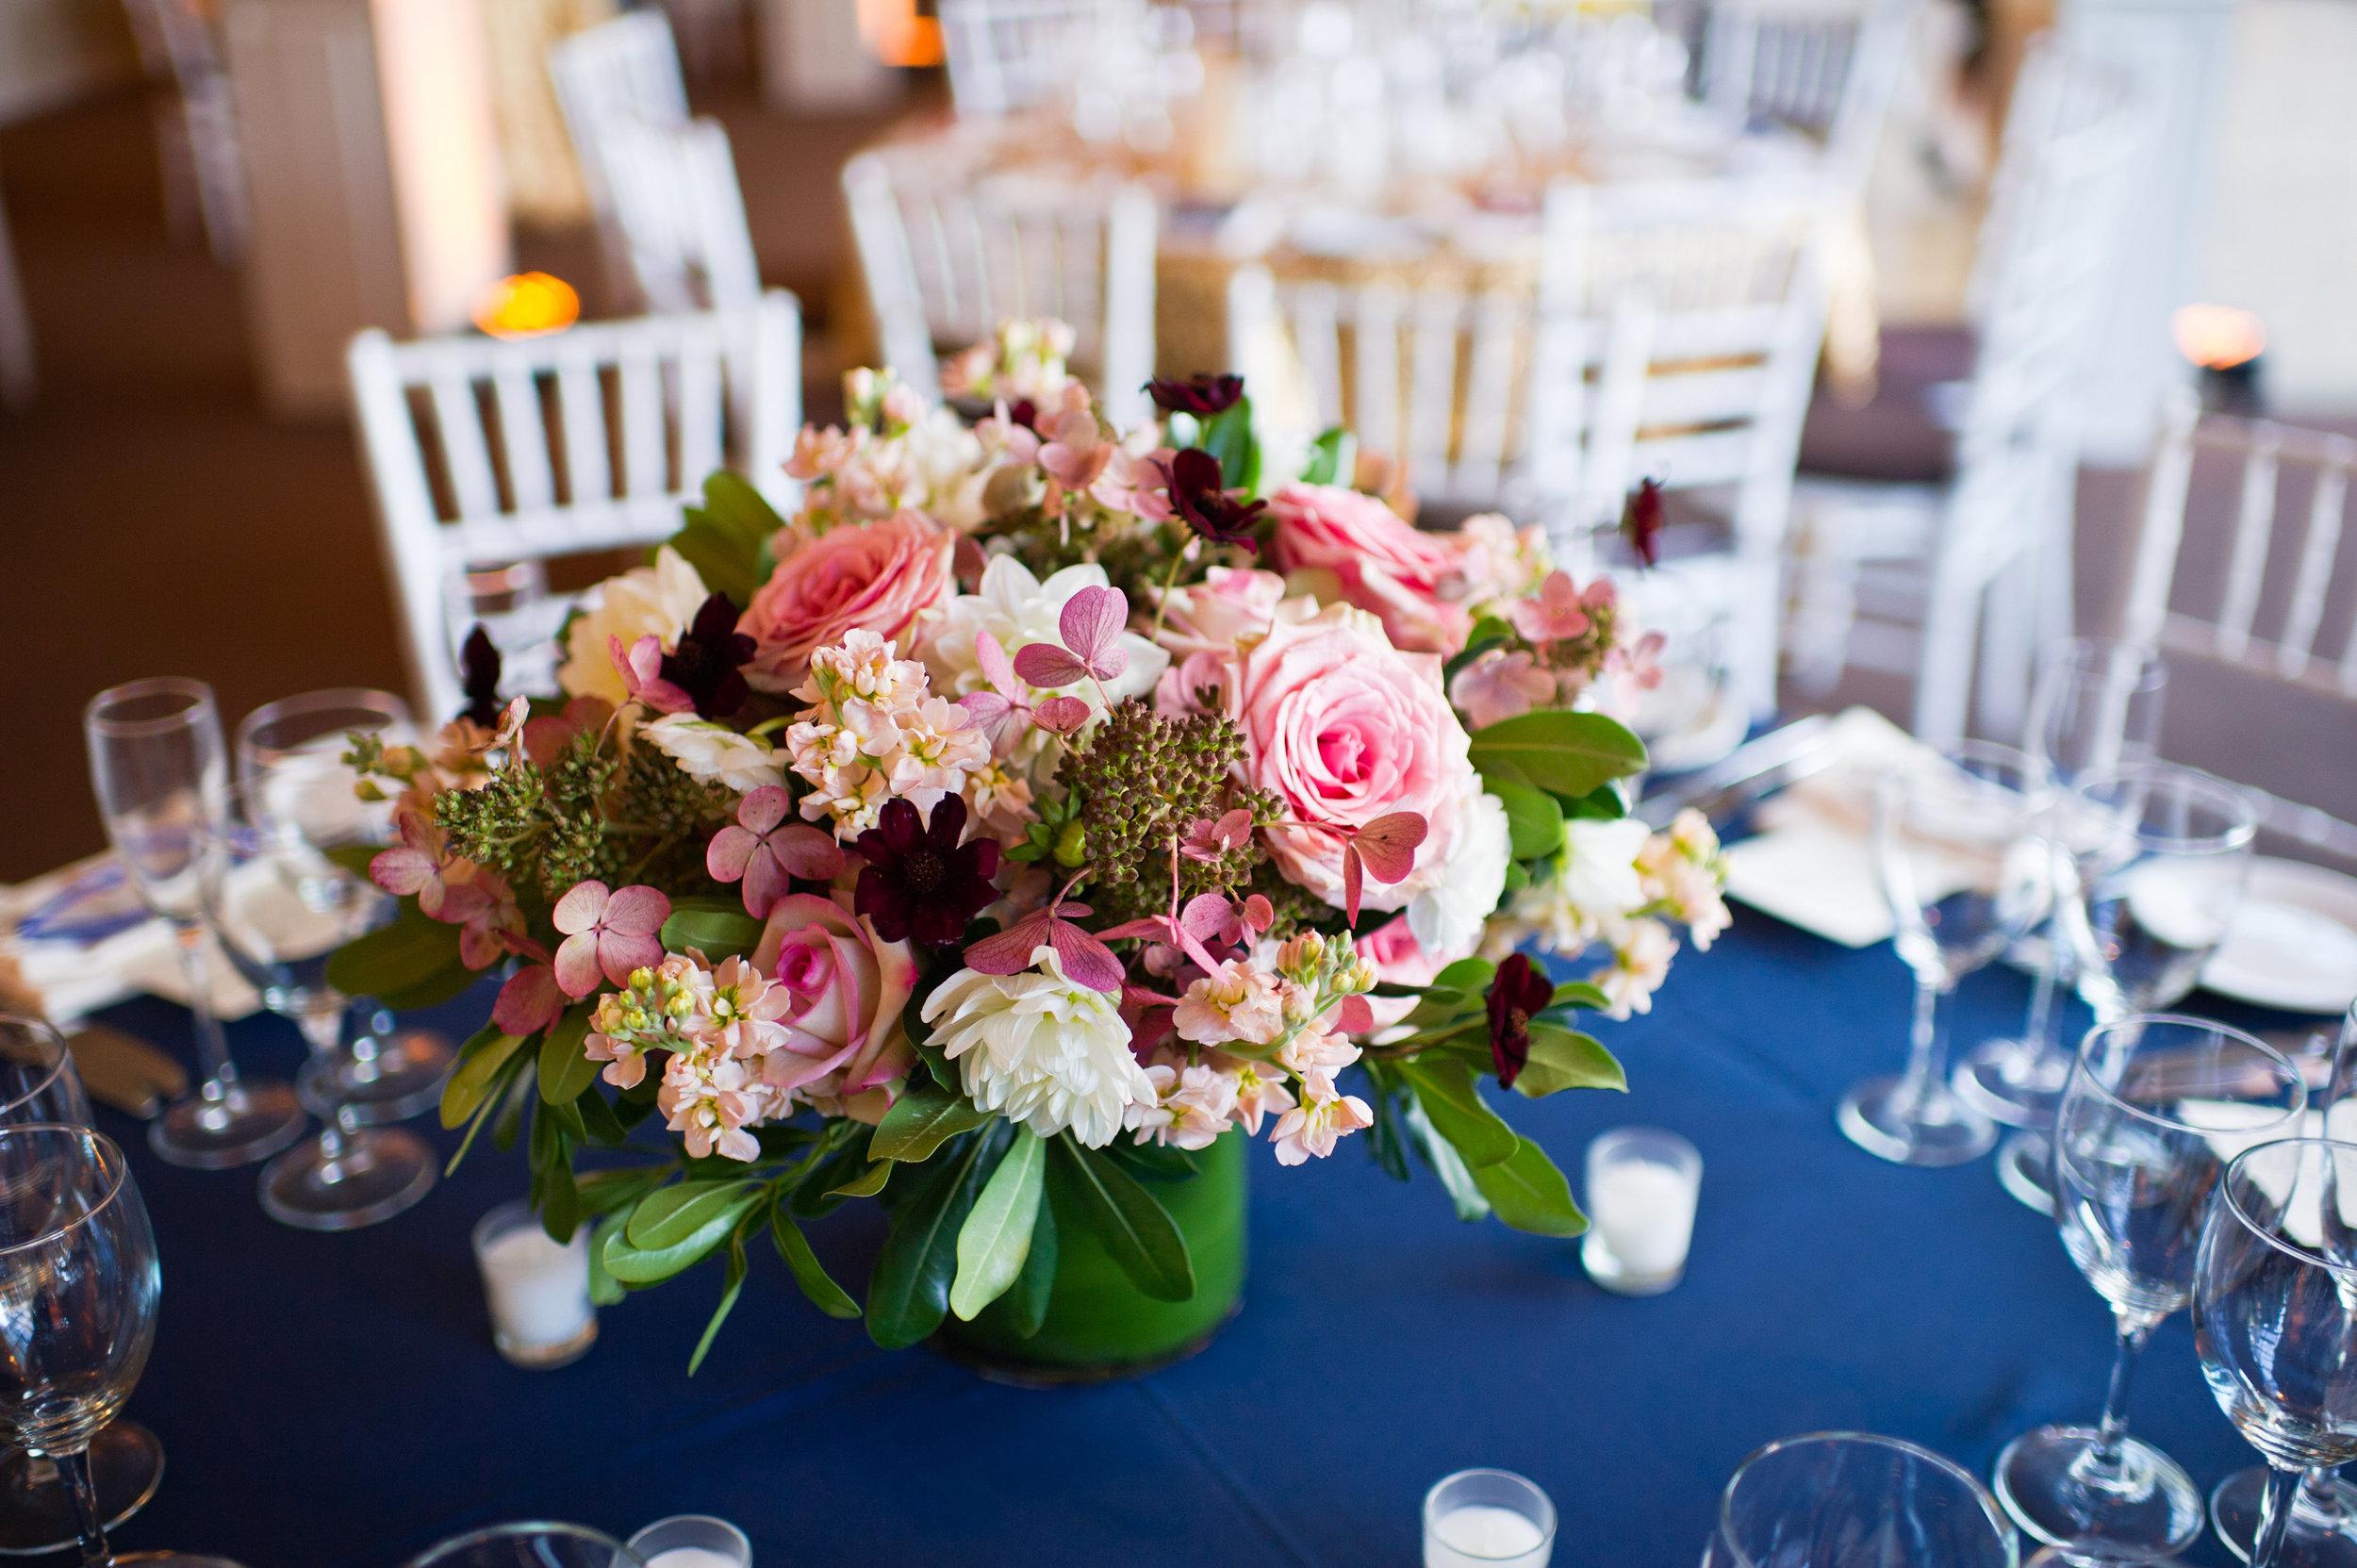 CT_Wedding_Planner_Crabtree_Kittle_House062.jpg